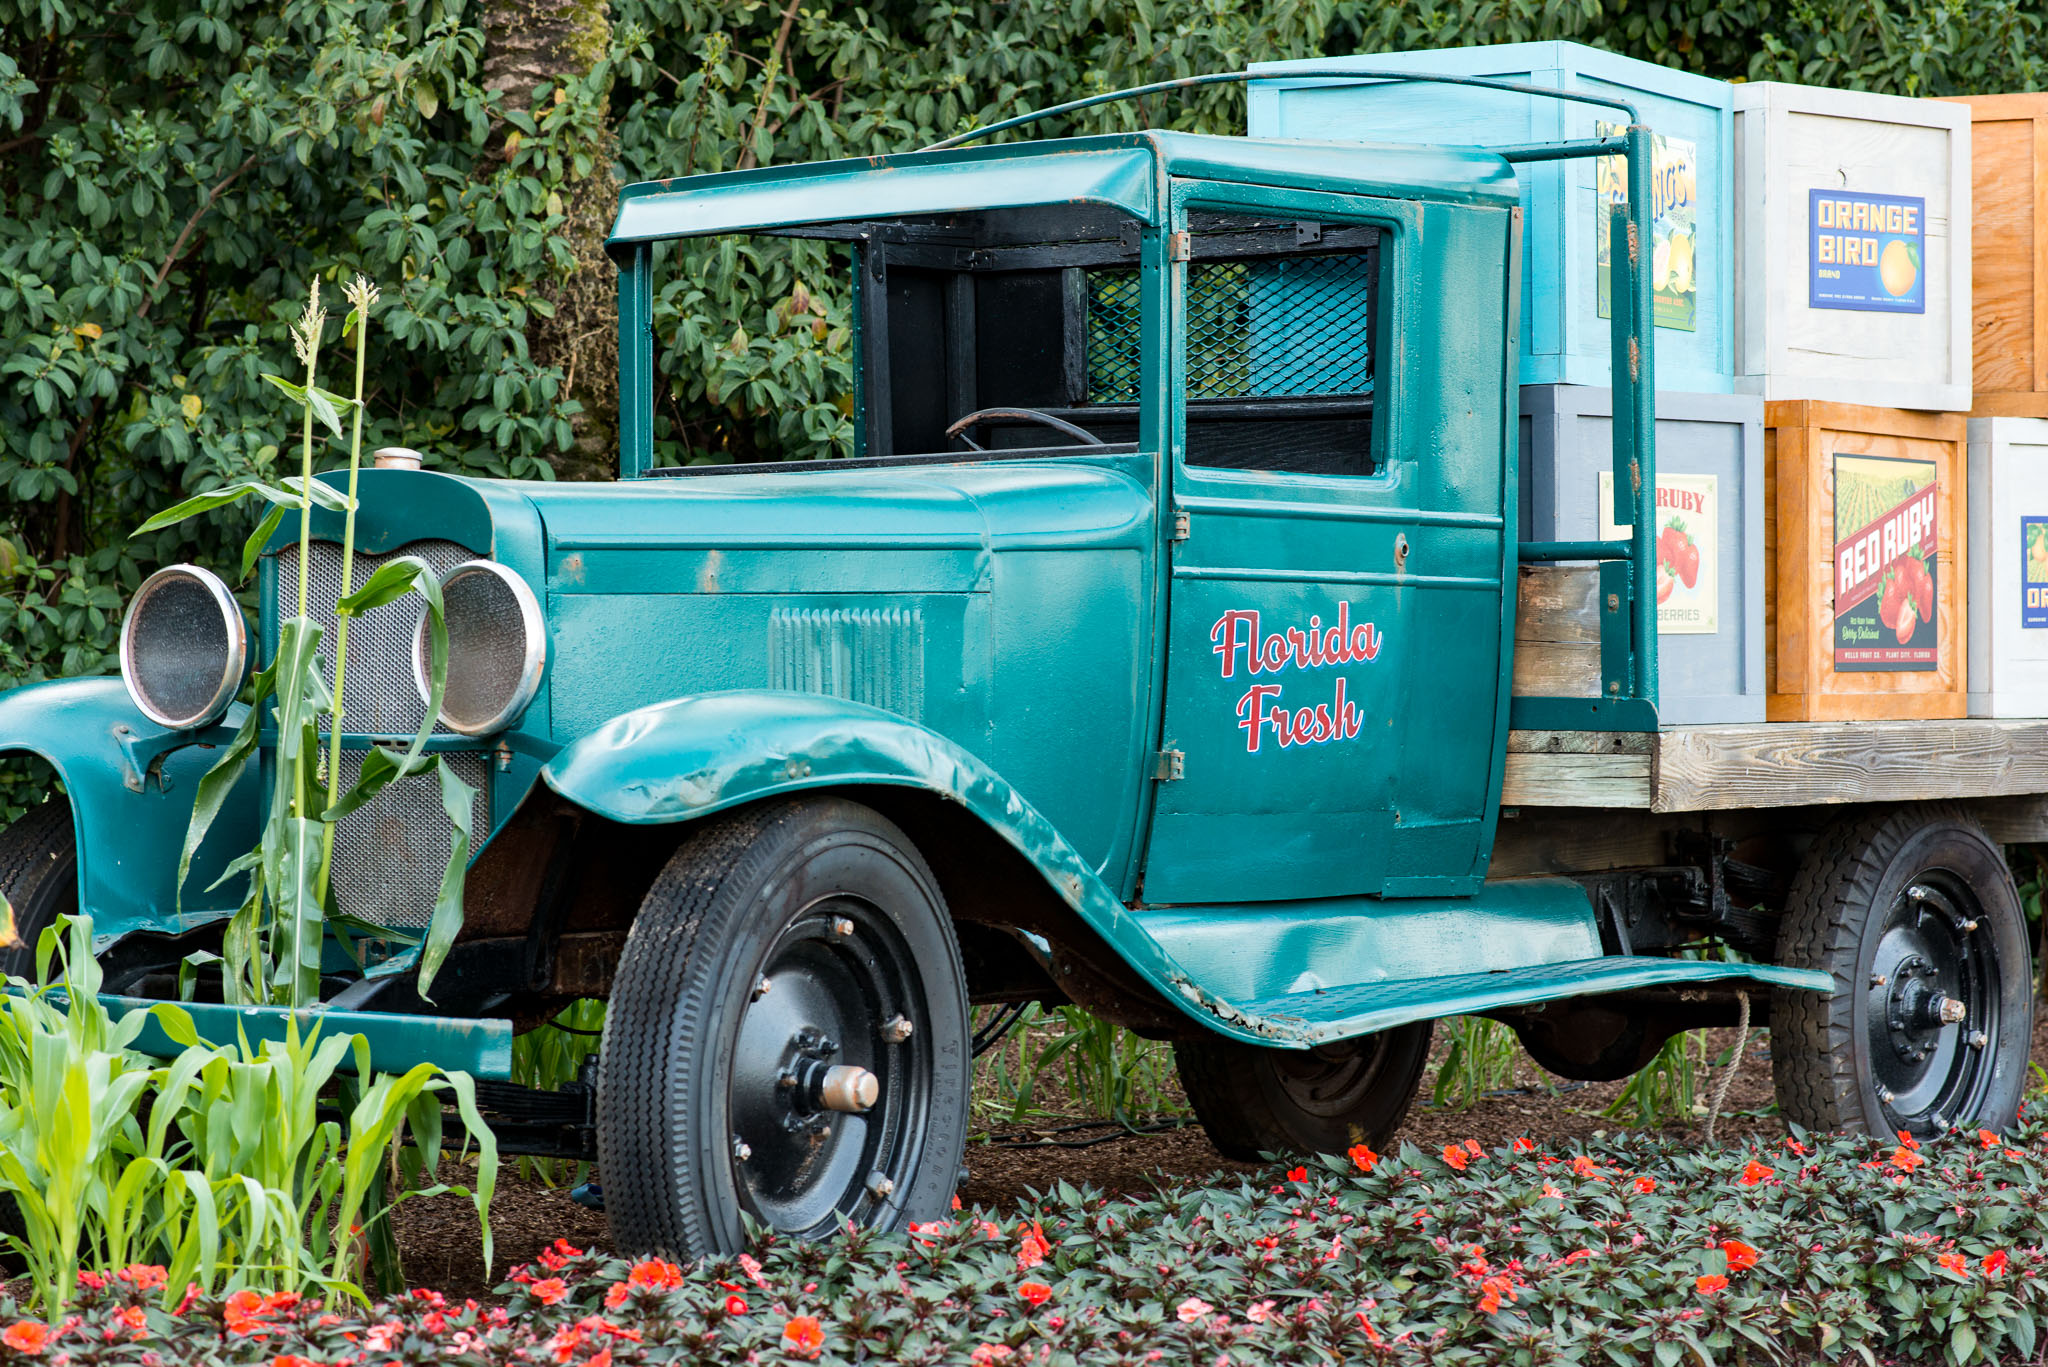 Florida Fresh Truck - Epcot Flower & Garden Festival 2016